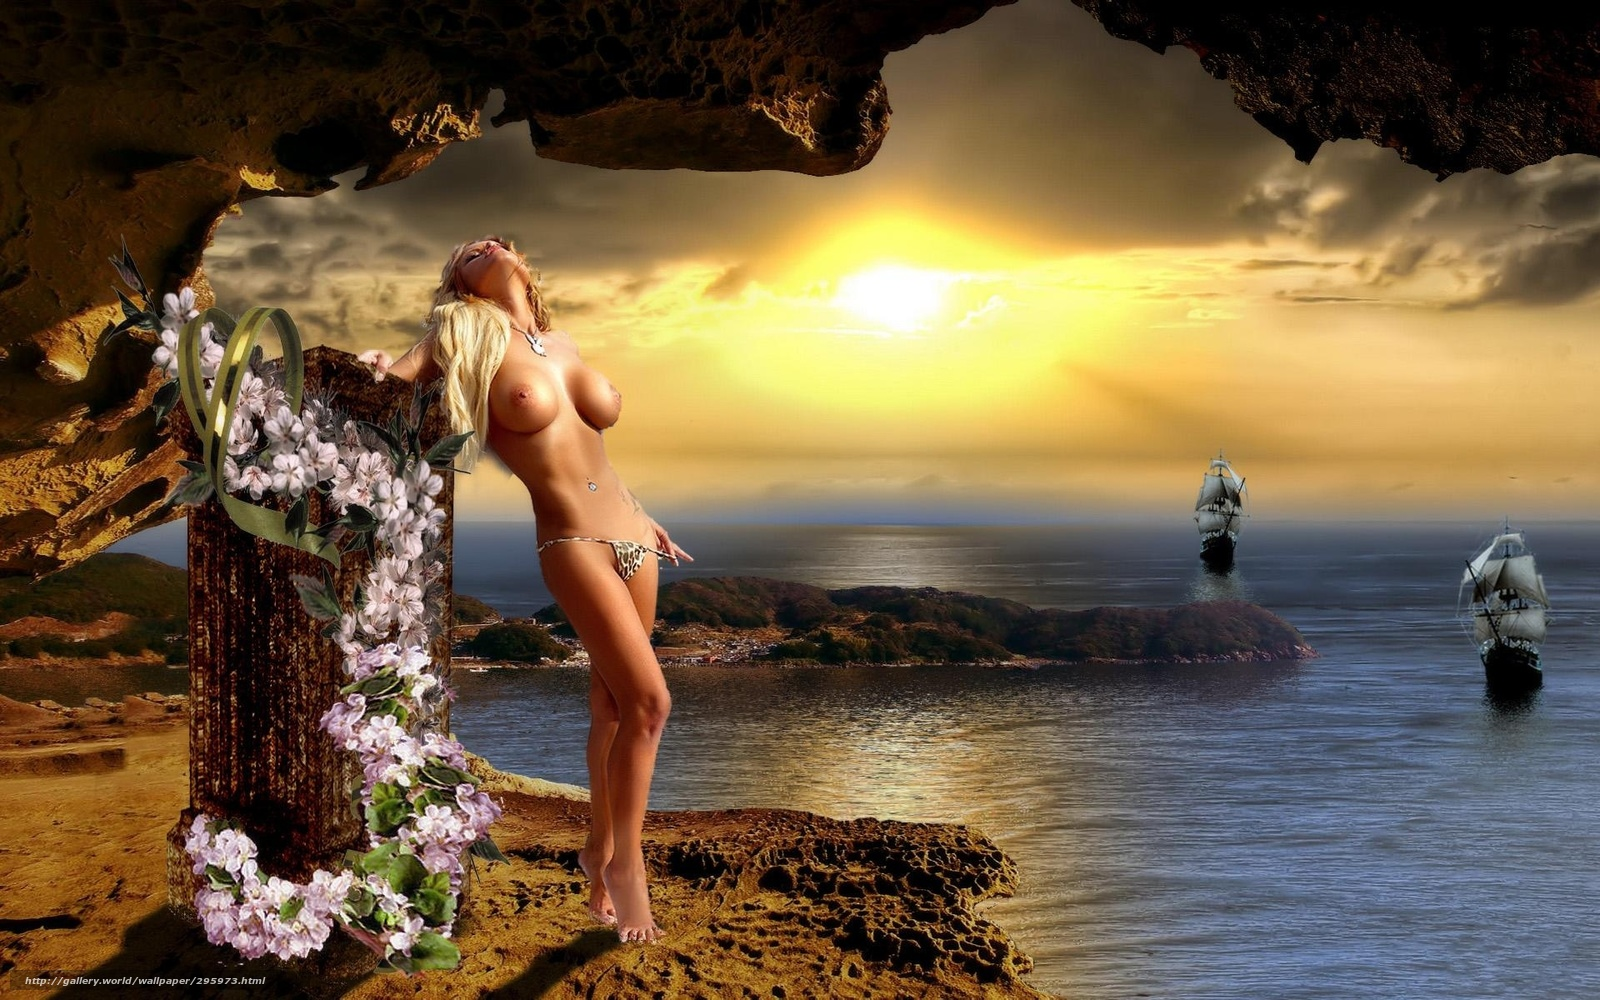 Эротика на фоне пейзажей 16 фотография